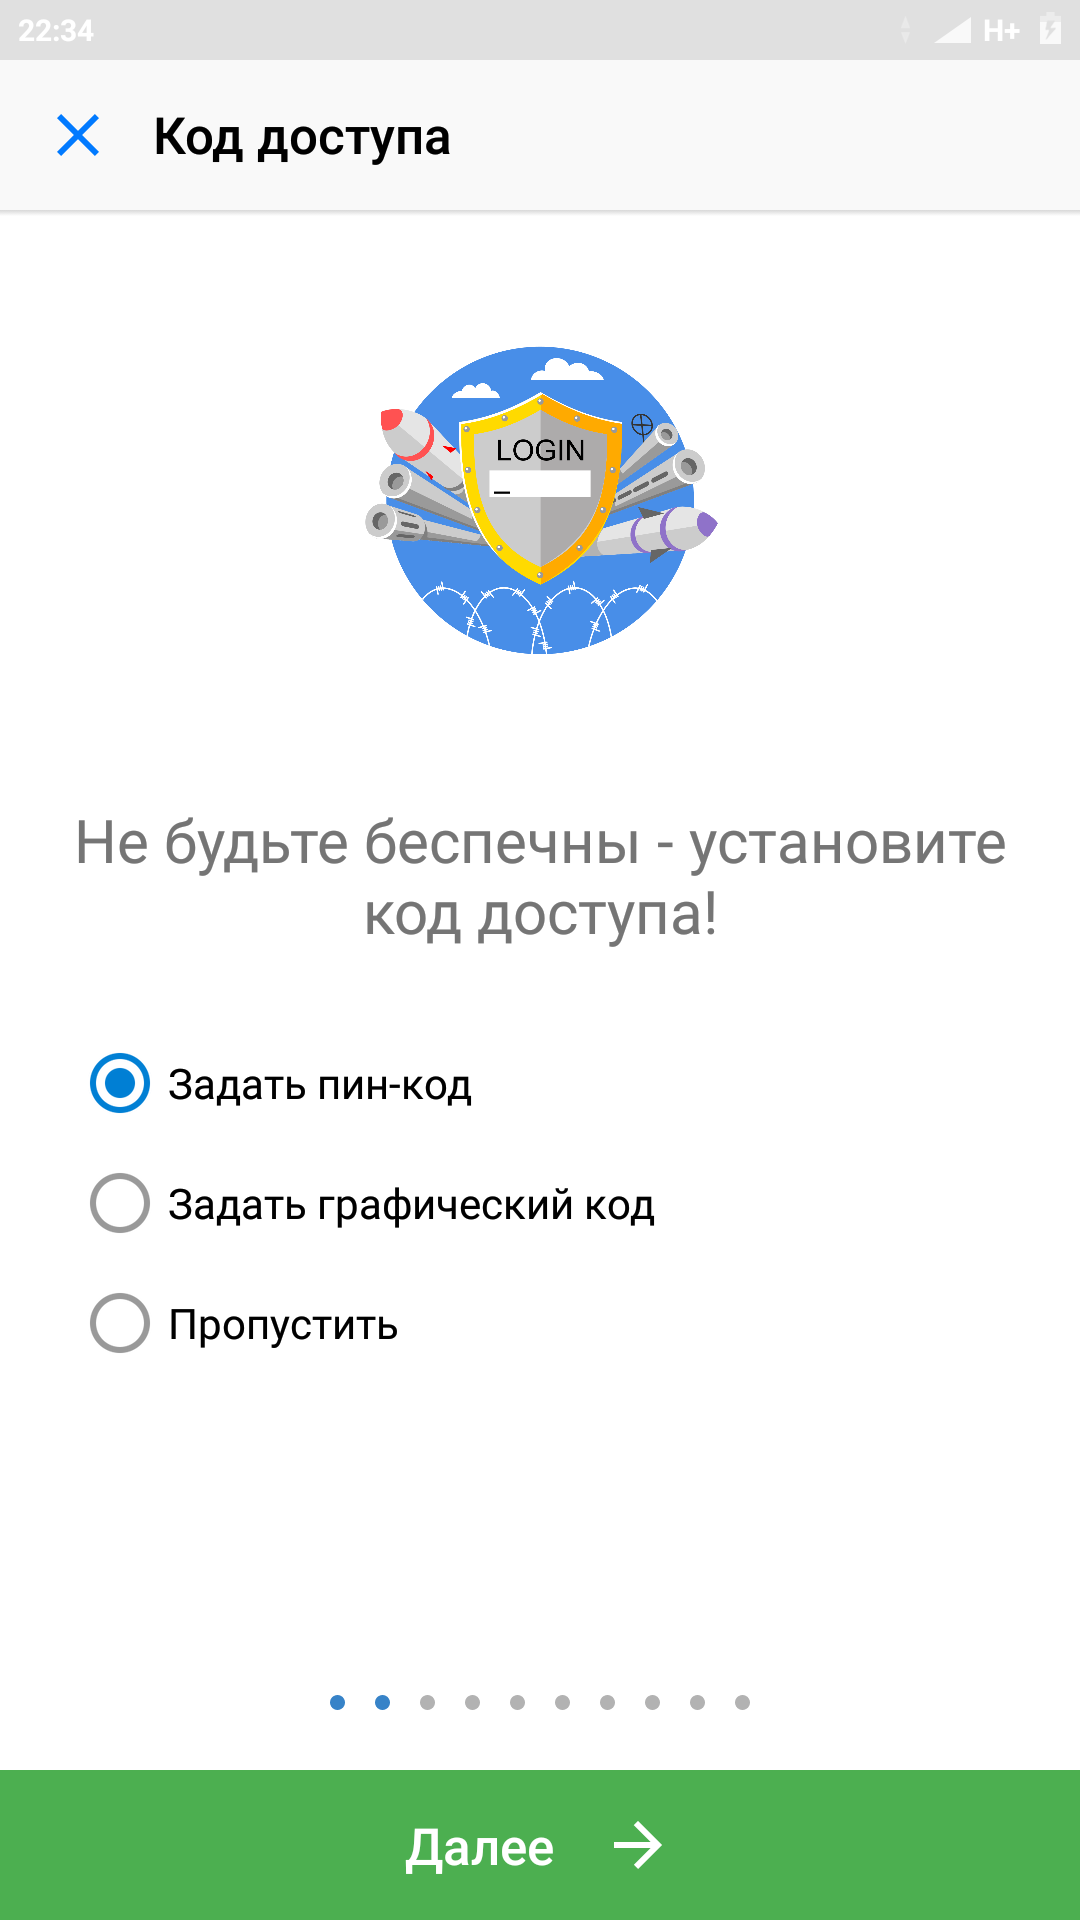 Просьба установить код доступа для WebMoney Keeper Standard (Mini)